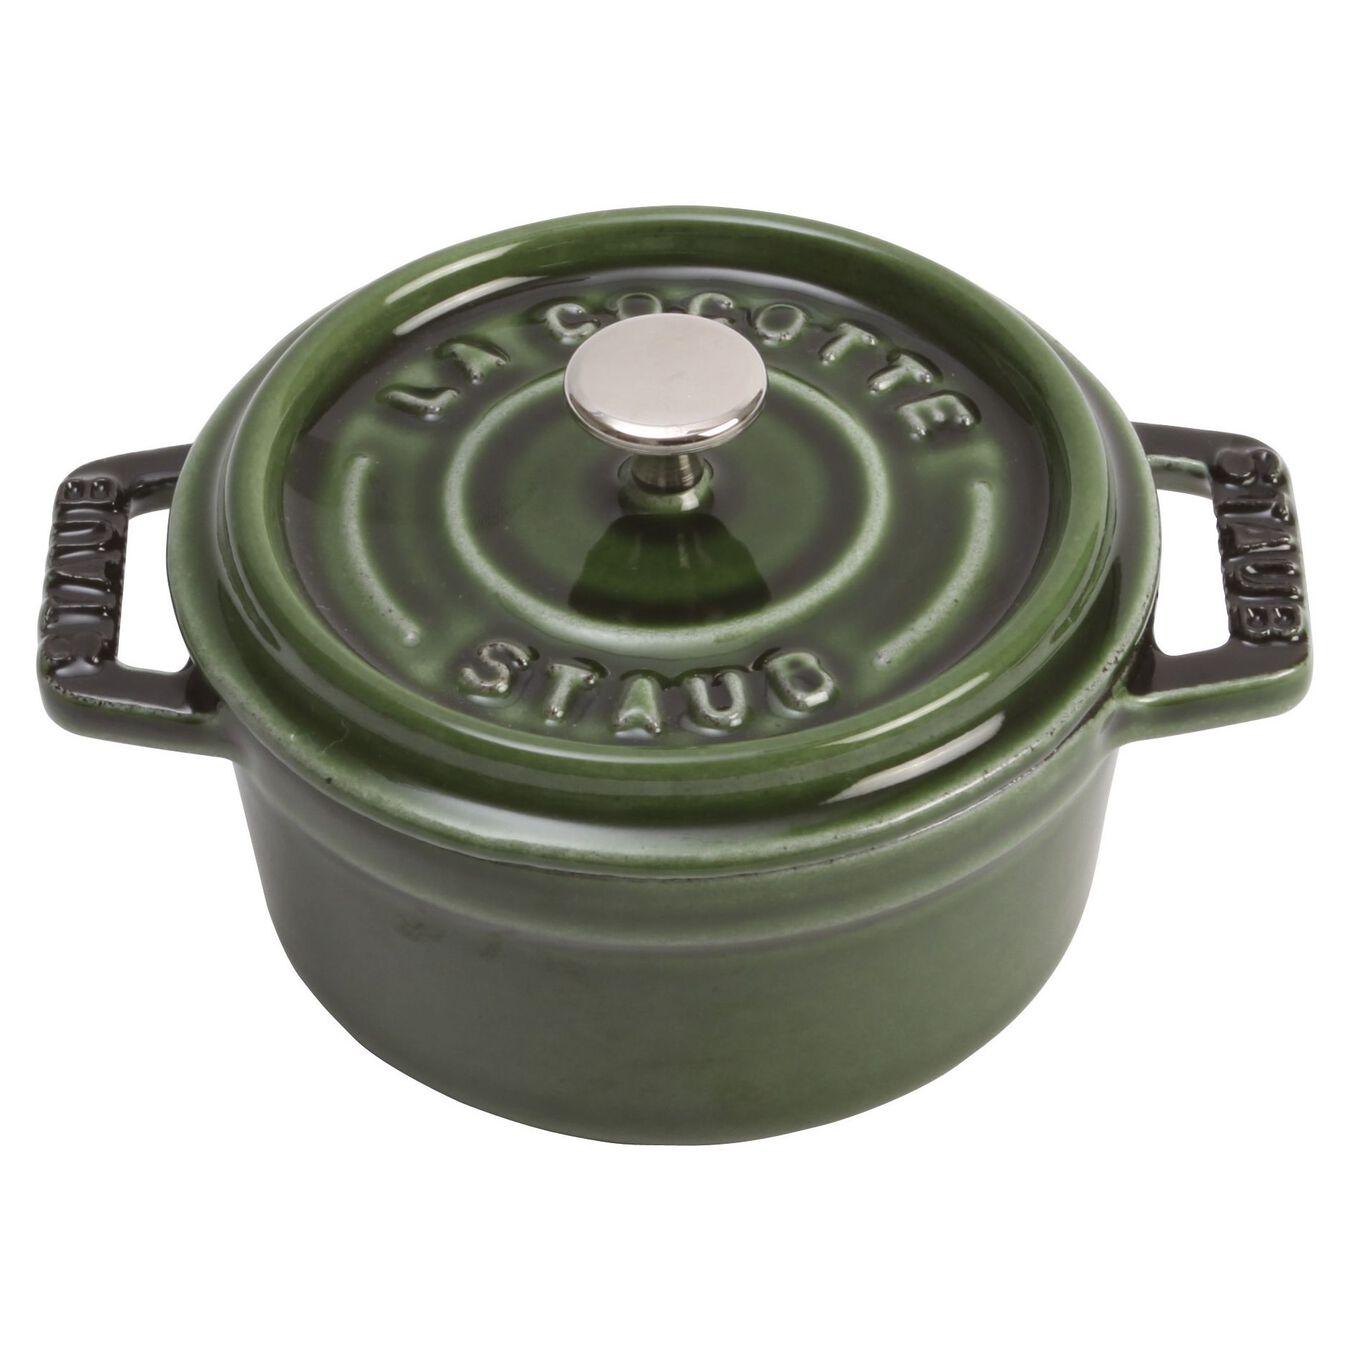 250 ml round Mini Cocotte, basil-green,,large 1